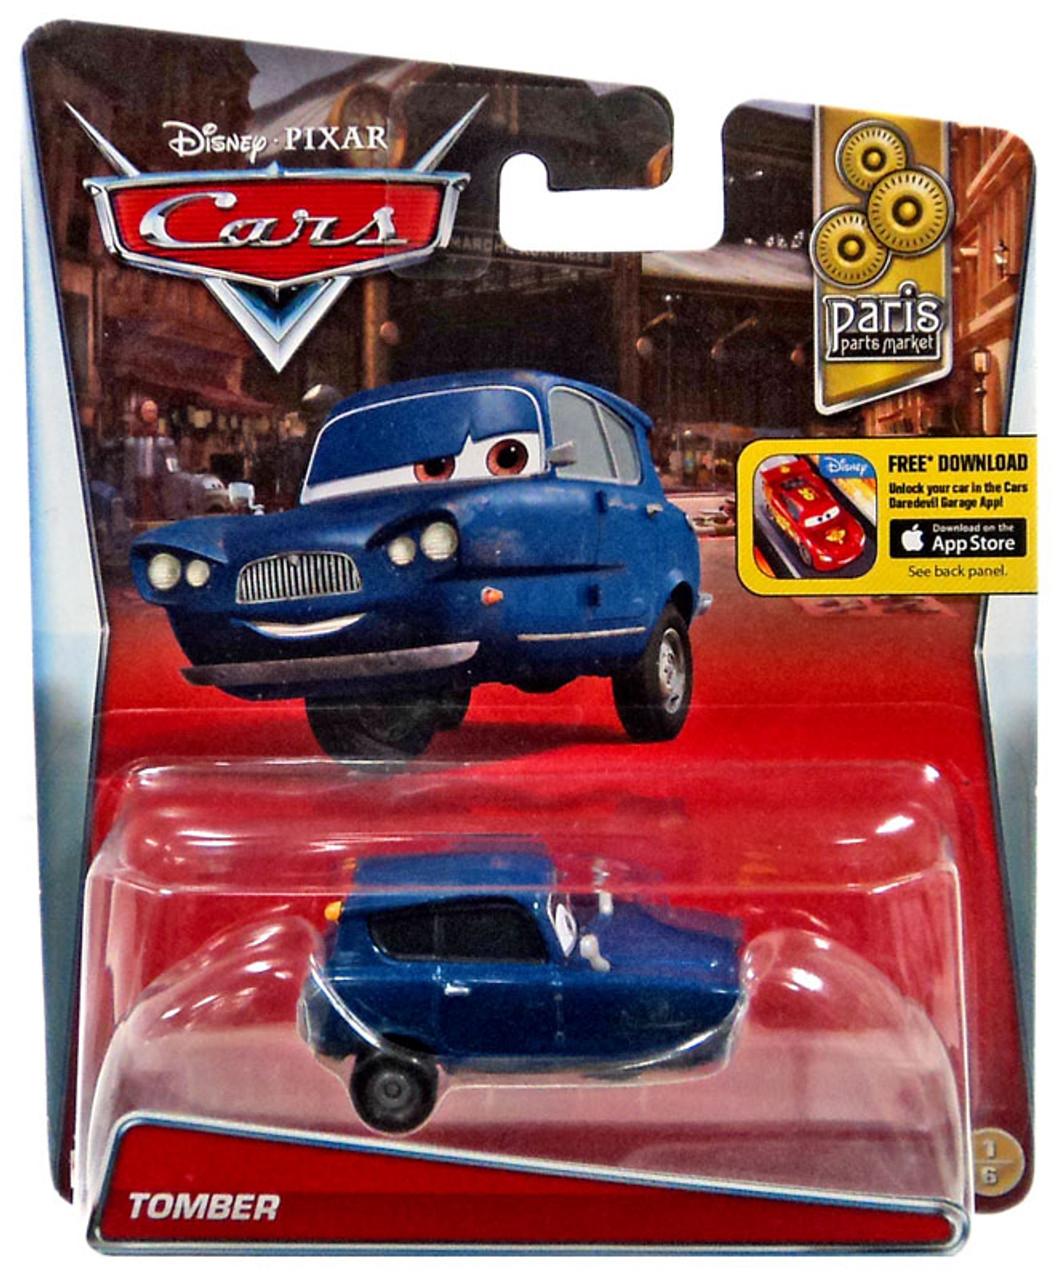 Disney Pixar Cars Paris Parts Market Tomber 155 Diecast Car 16